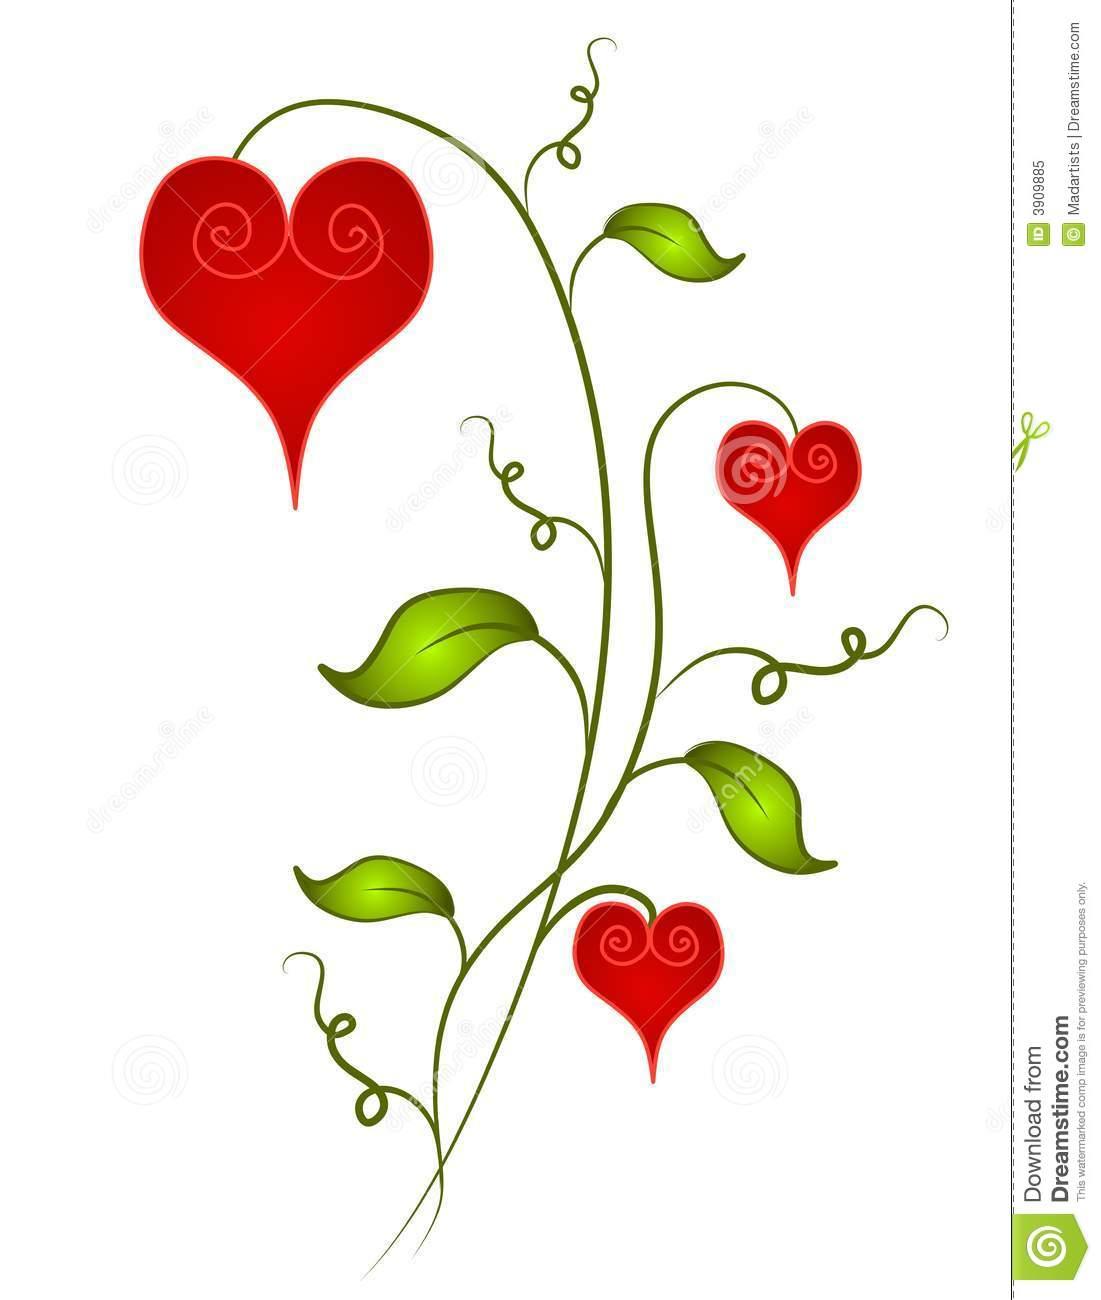 Flower heart clip art.